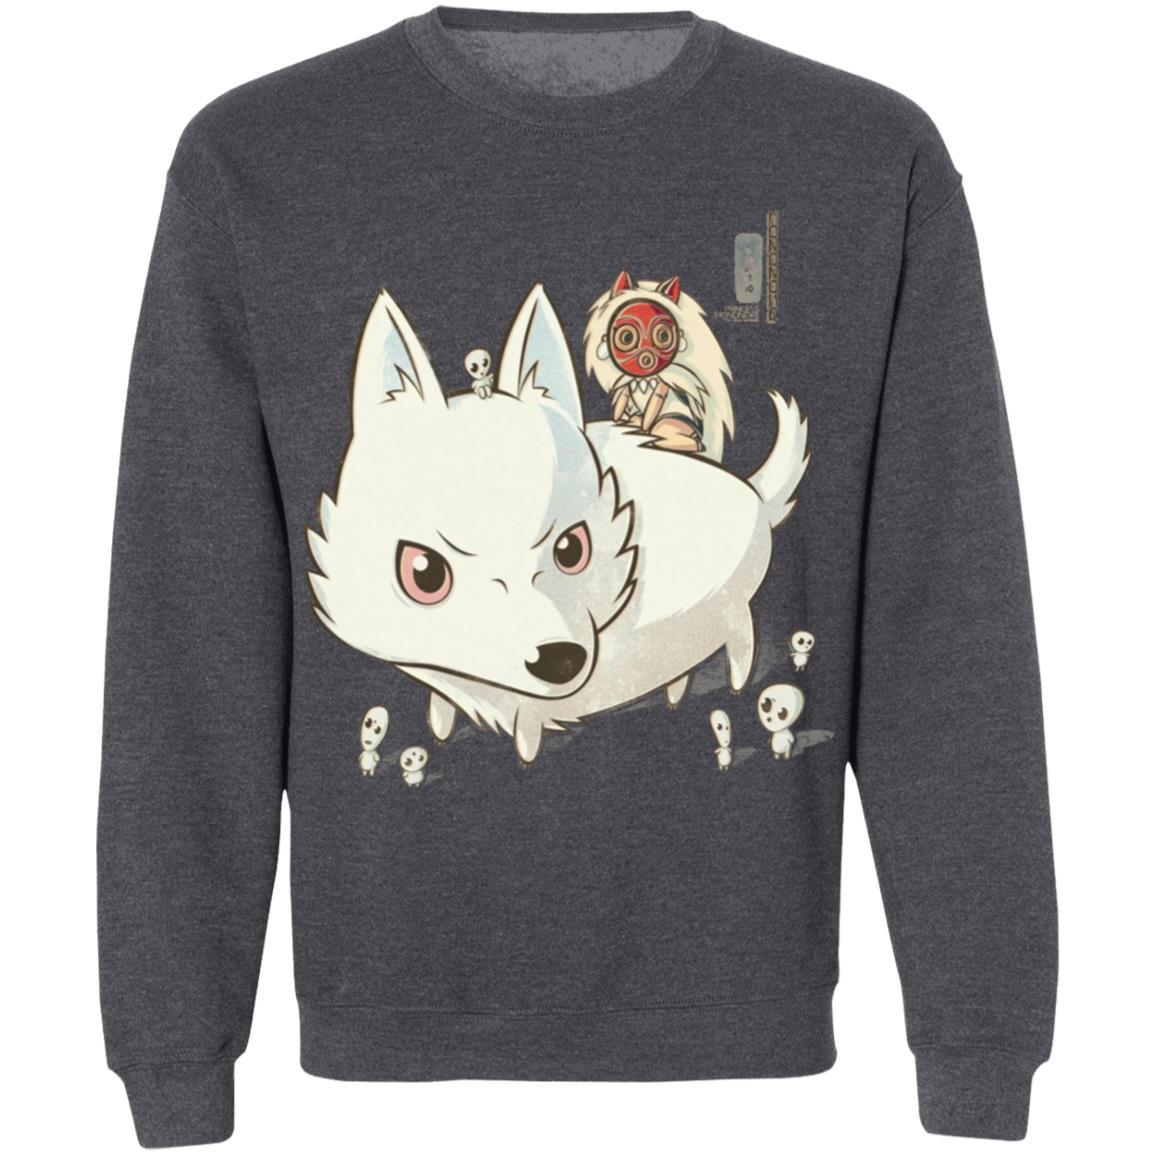 Princess Mononoke and The Wolf Cute Chibi Version Sweatshirt